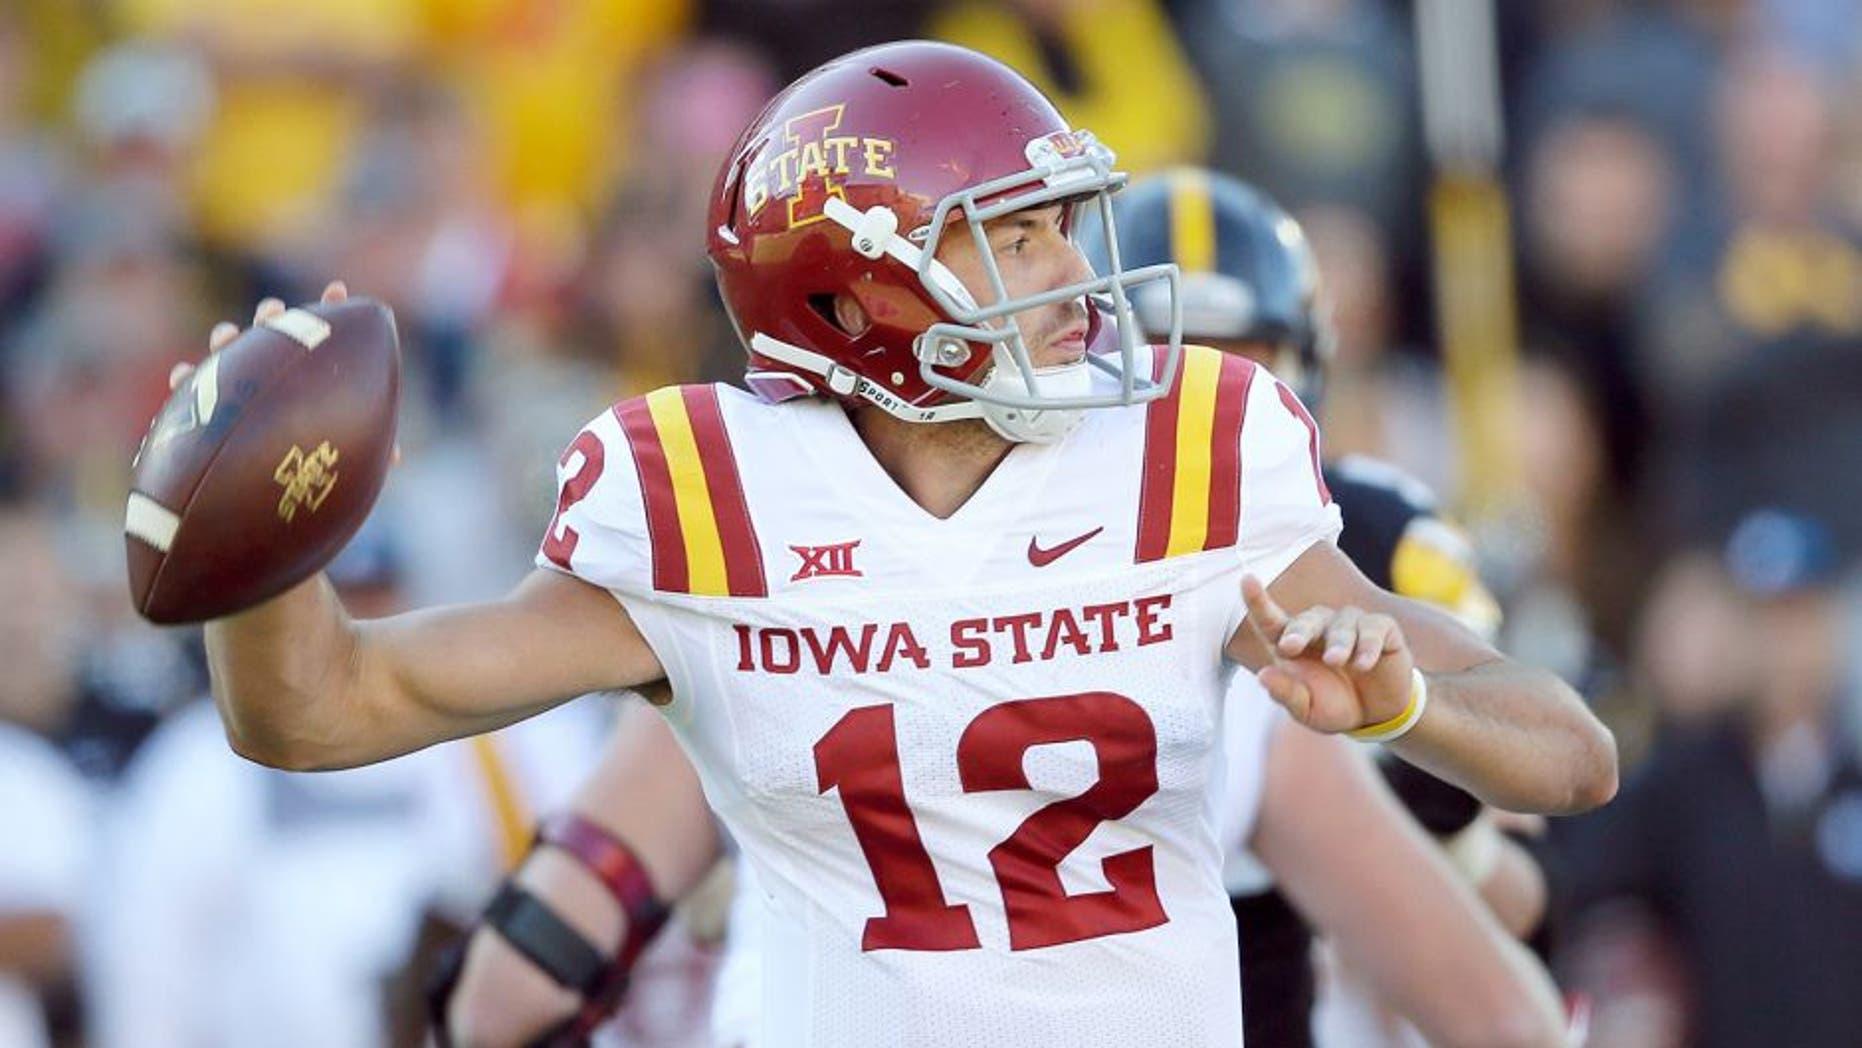 Iowa State quarterback Sam B. Richardson throws a pass during the second half of an NCAA college football game against Iowa, Saturday, Sept. 13, 2014, in Iowa City, Iowa. Iowa State won 20-17. (AP Photo/Charlie Neibergall)